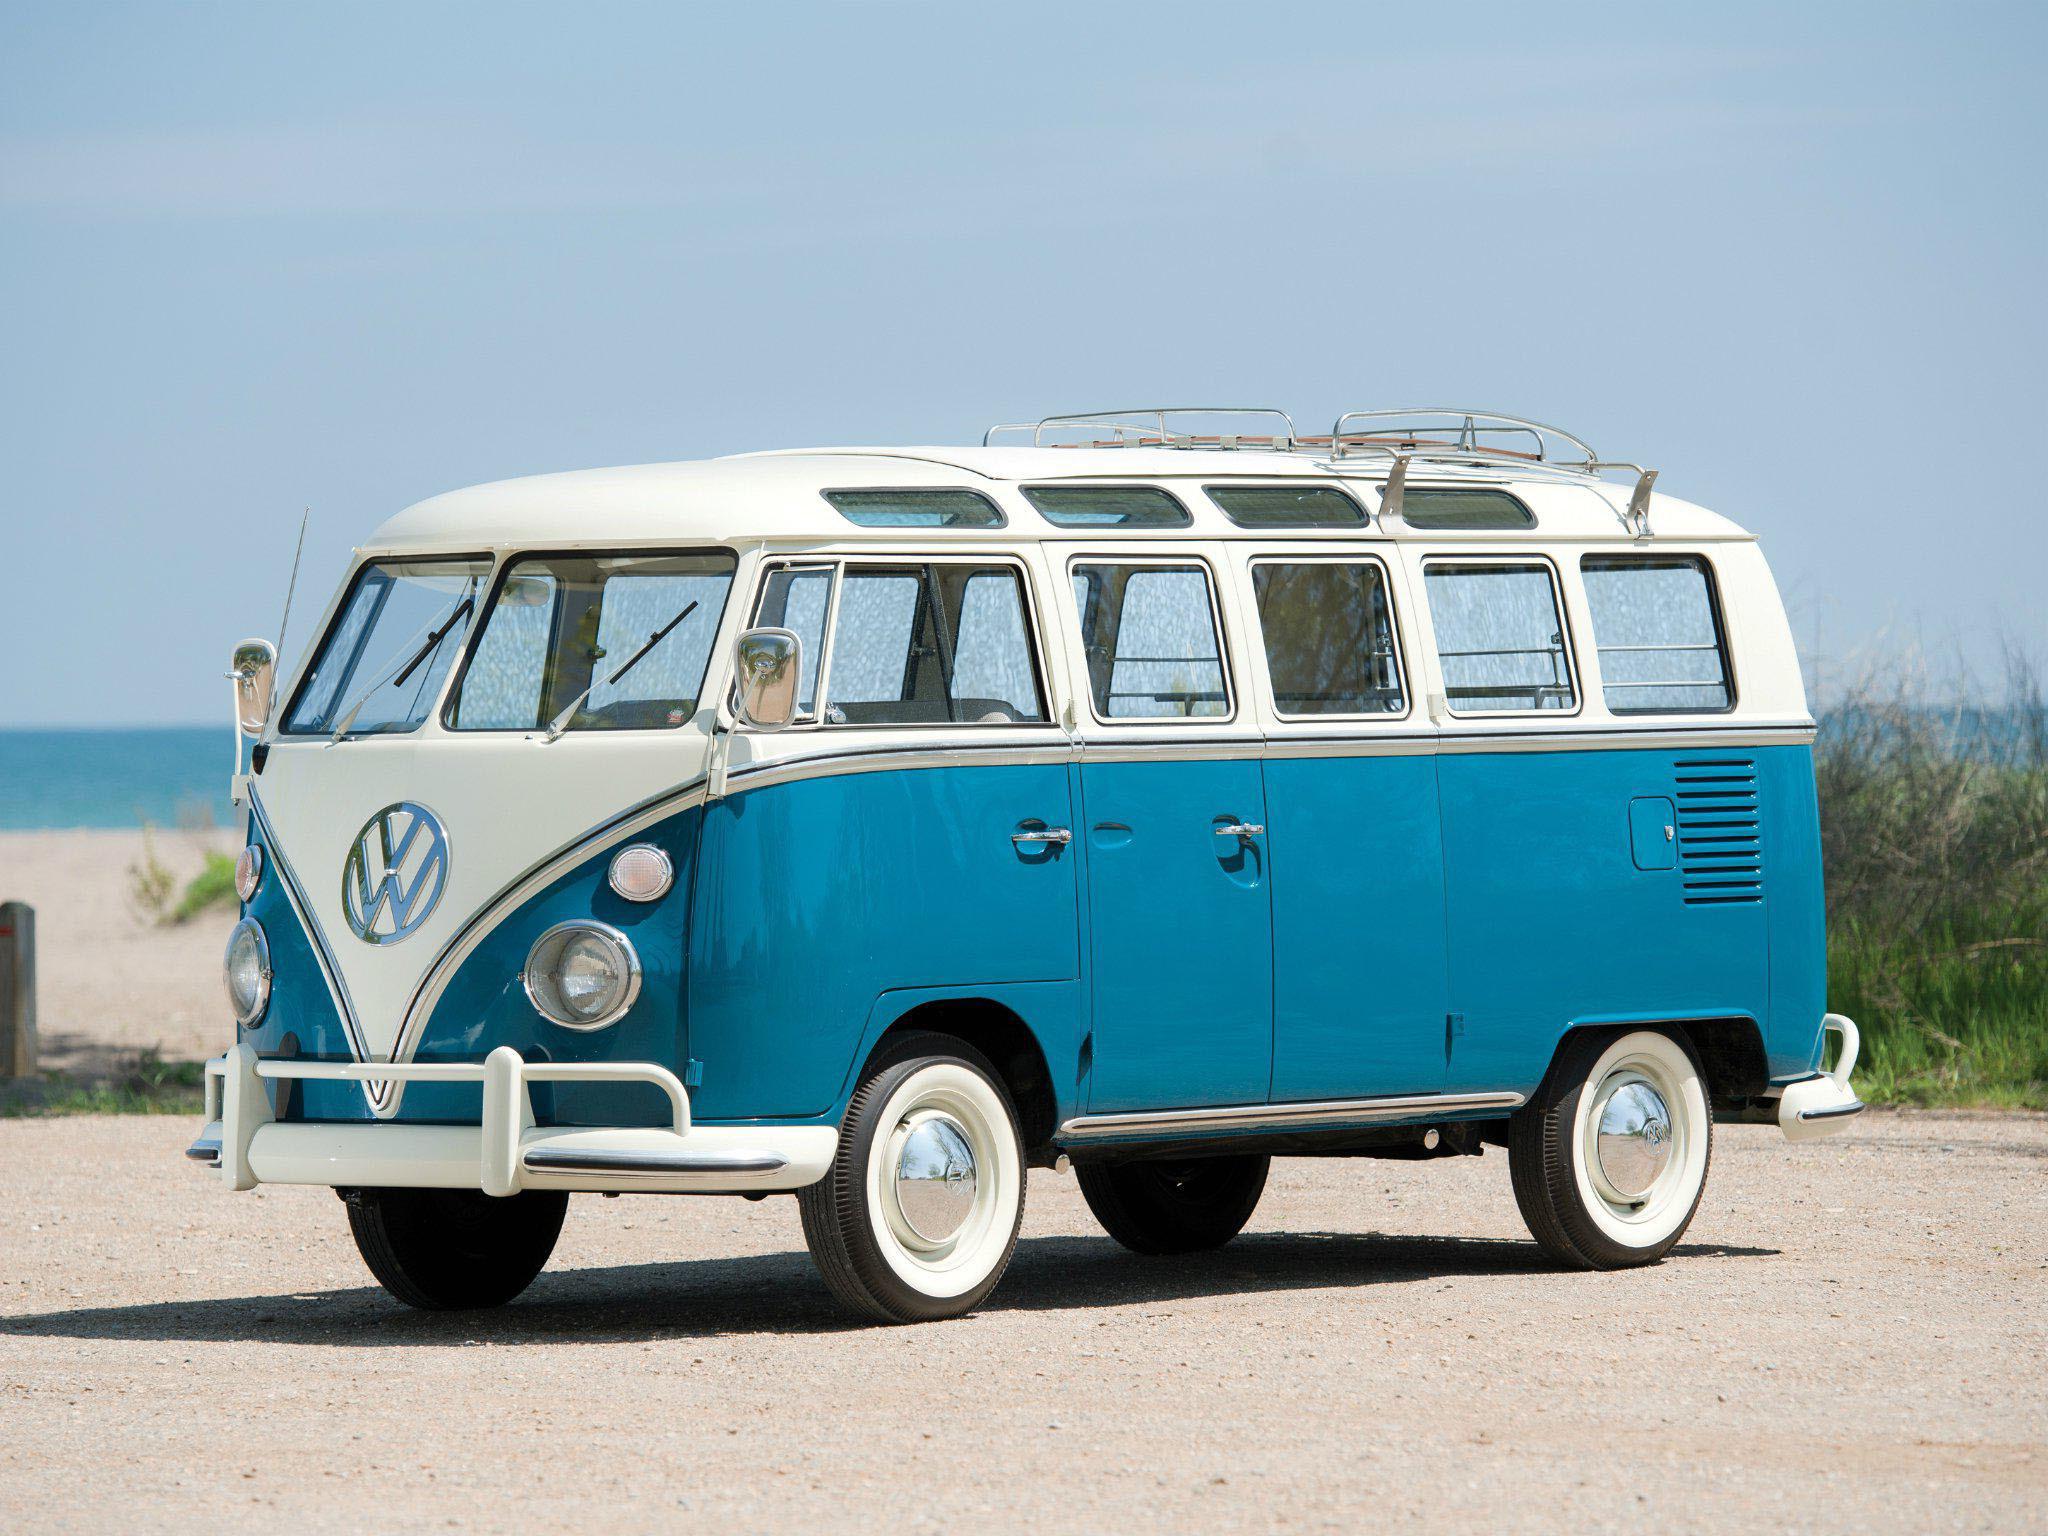 VW Bus Wallpaper ·① WallpaperTag